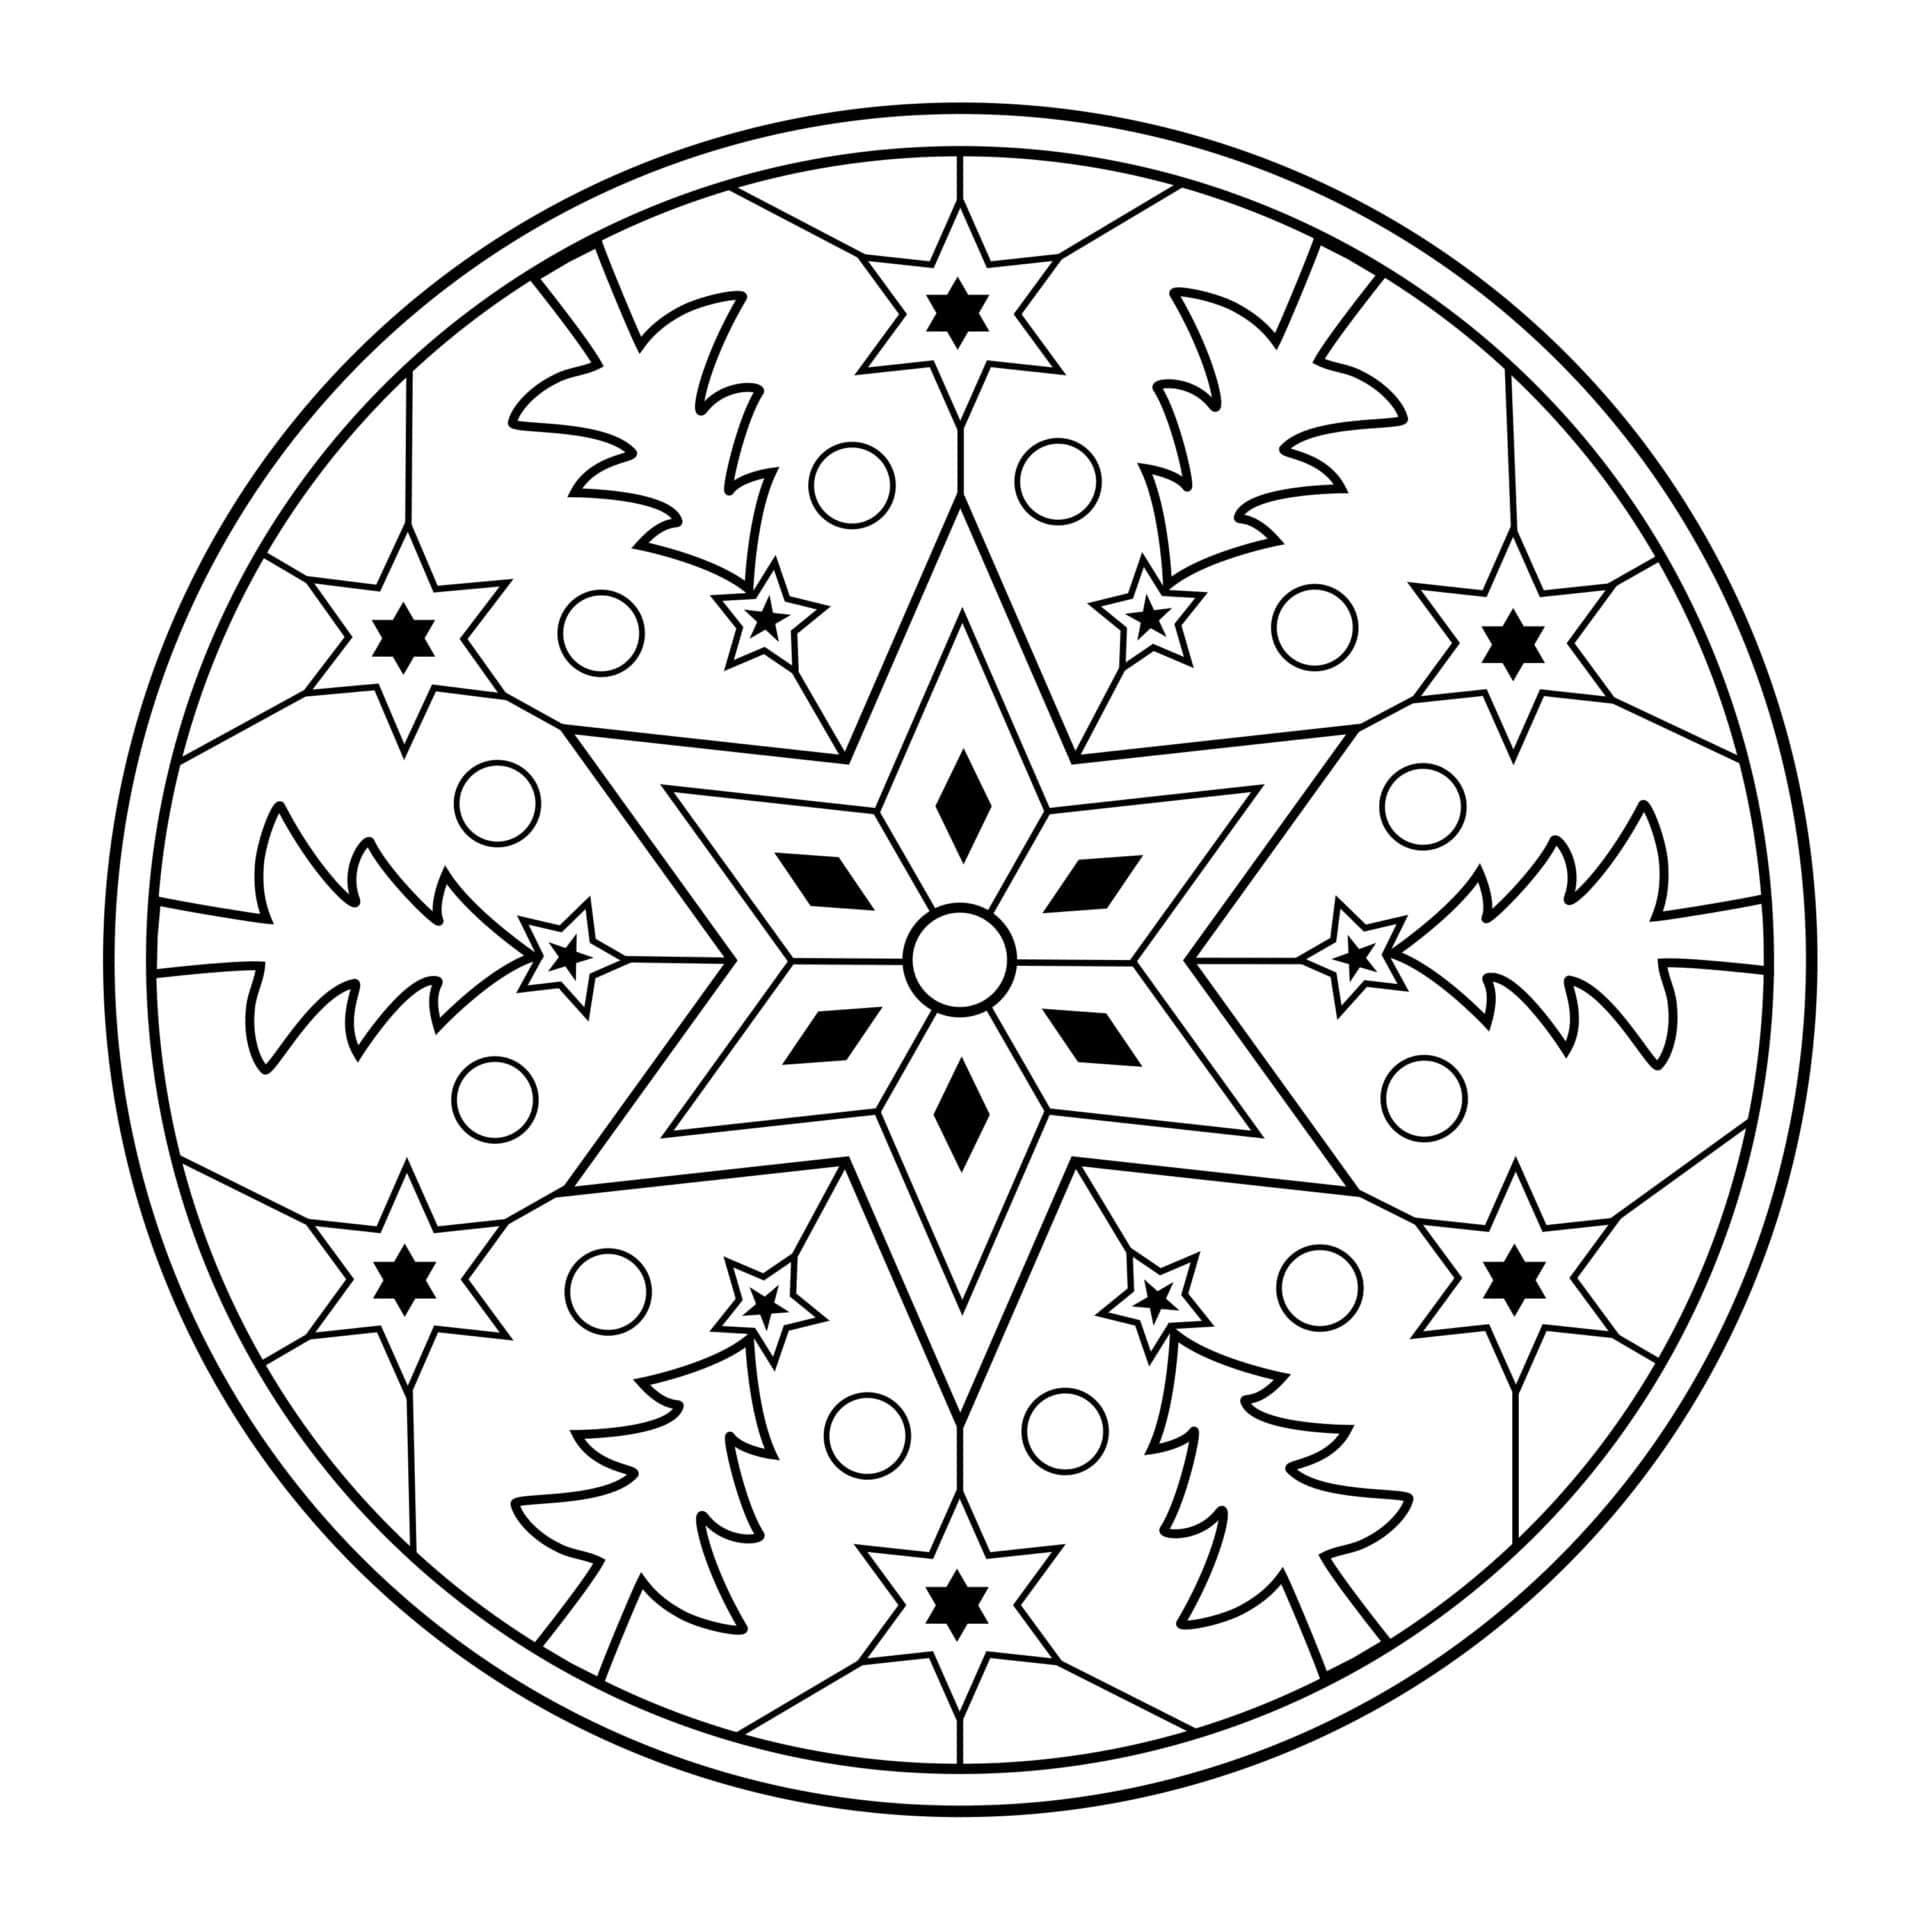 Coloriage Mandala Maternelle A Imprimer Gratuit.Mandala De Noel Gratuit A Imprimer Un Max D Idees